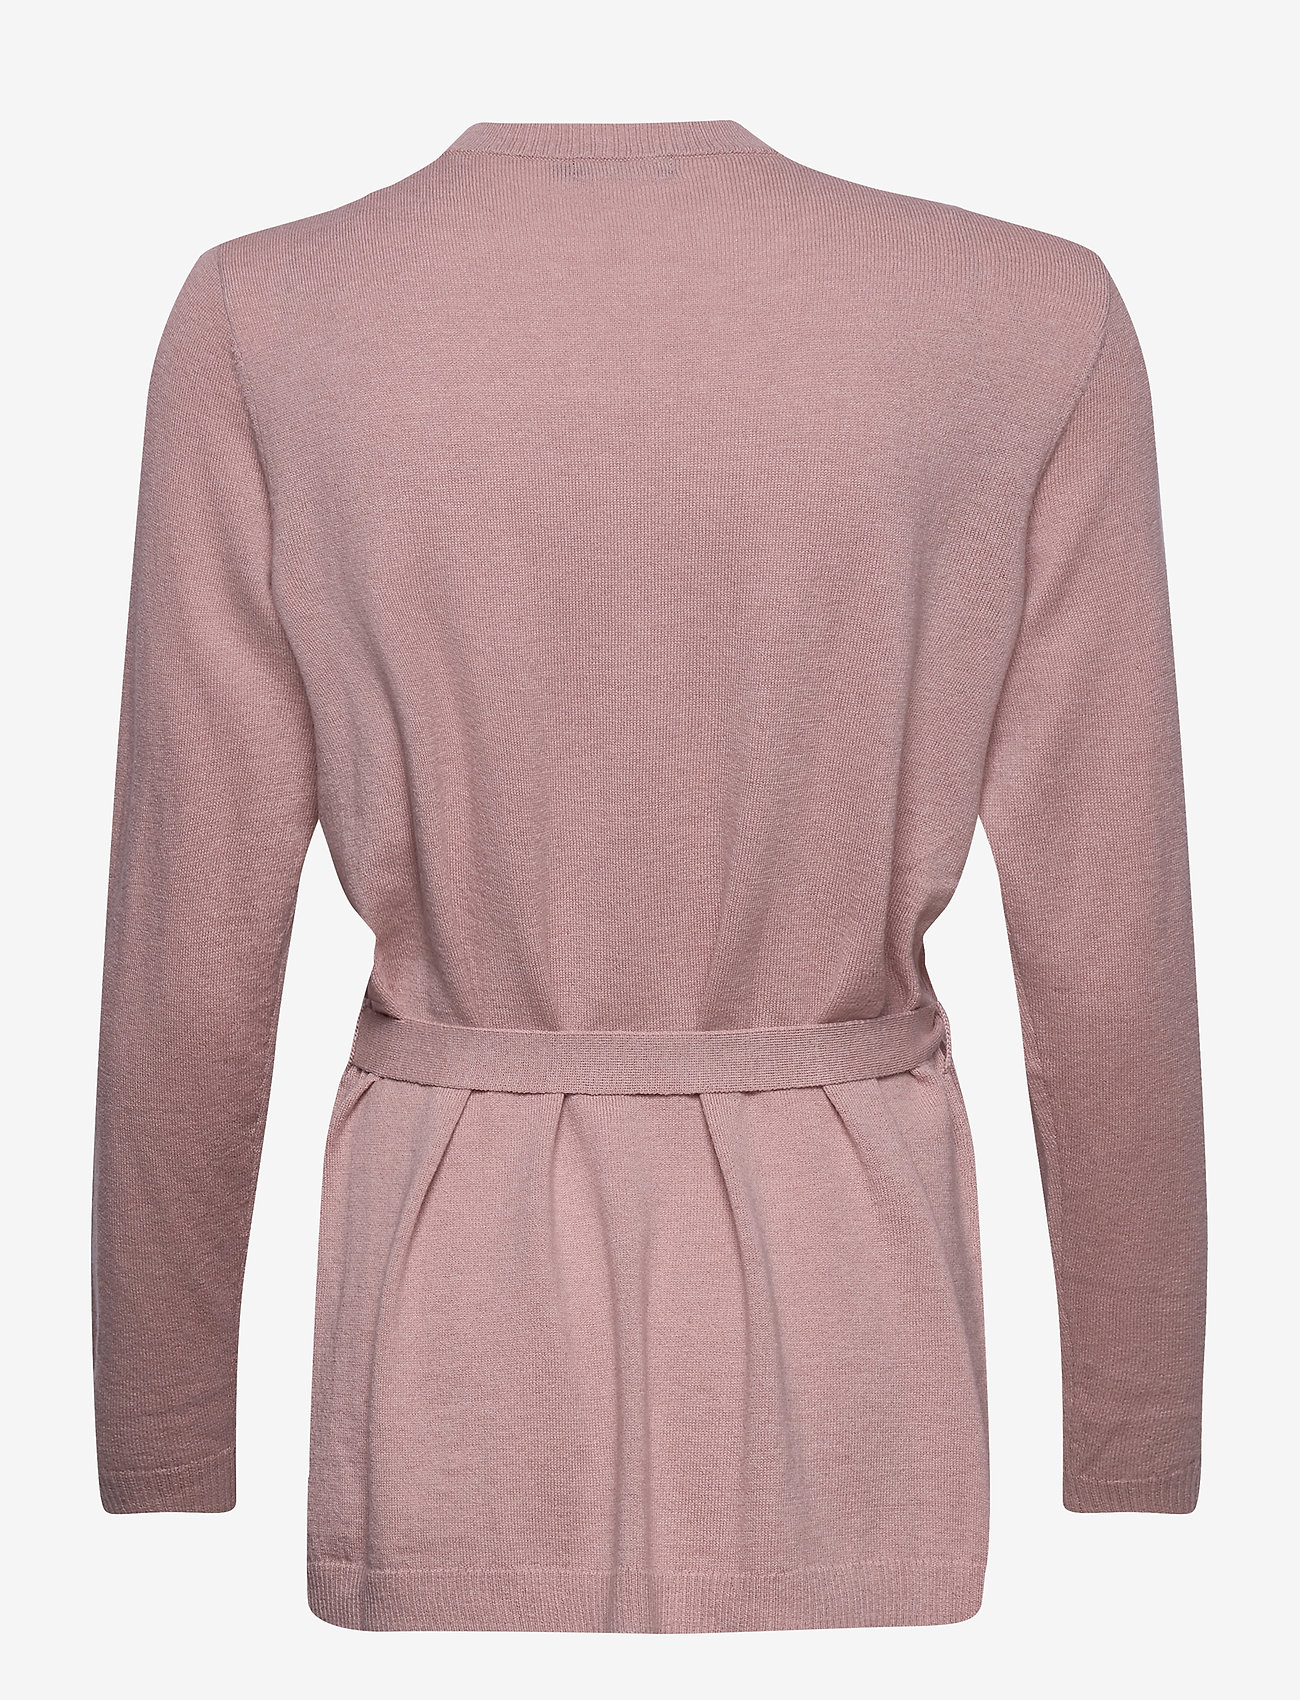 Nanso - Ladies knit cardigan, Villis - gilets - beige - 1